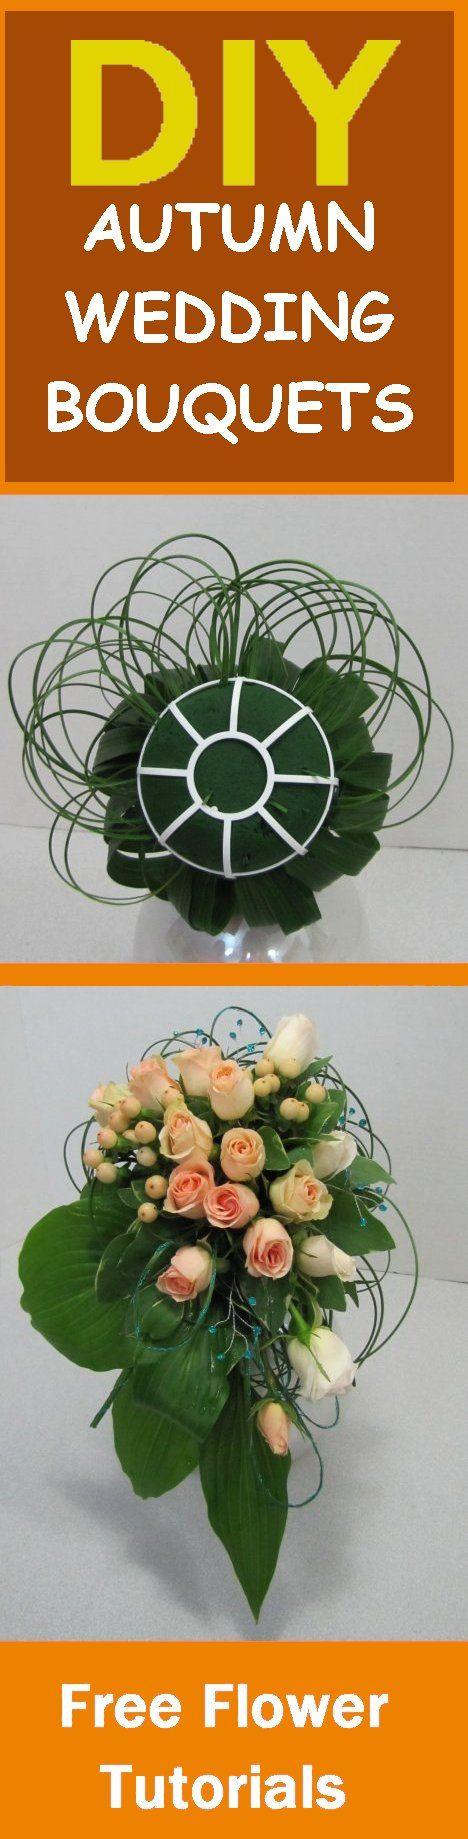 19 best Wholesale Flower Tools images on Pinterest   Flower ...